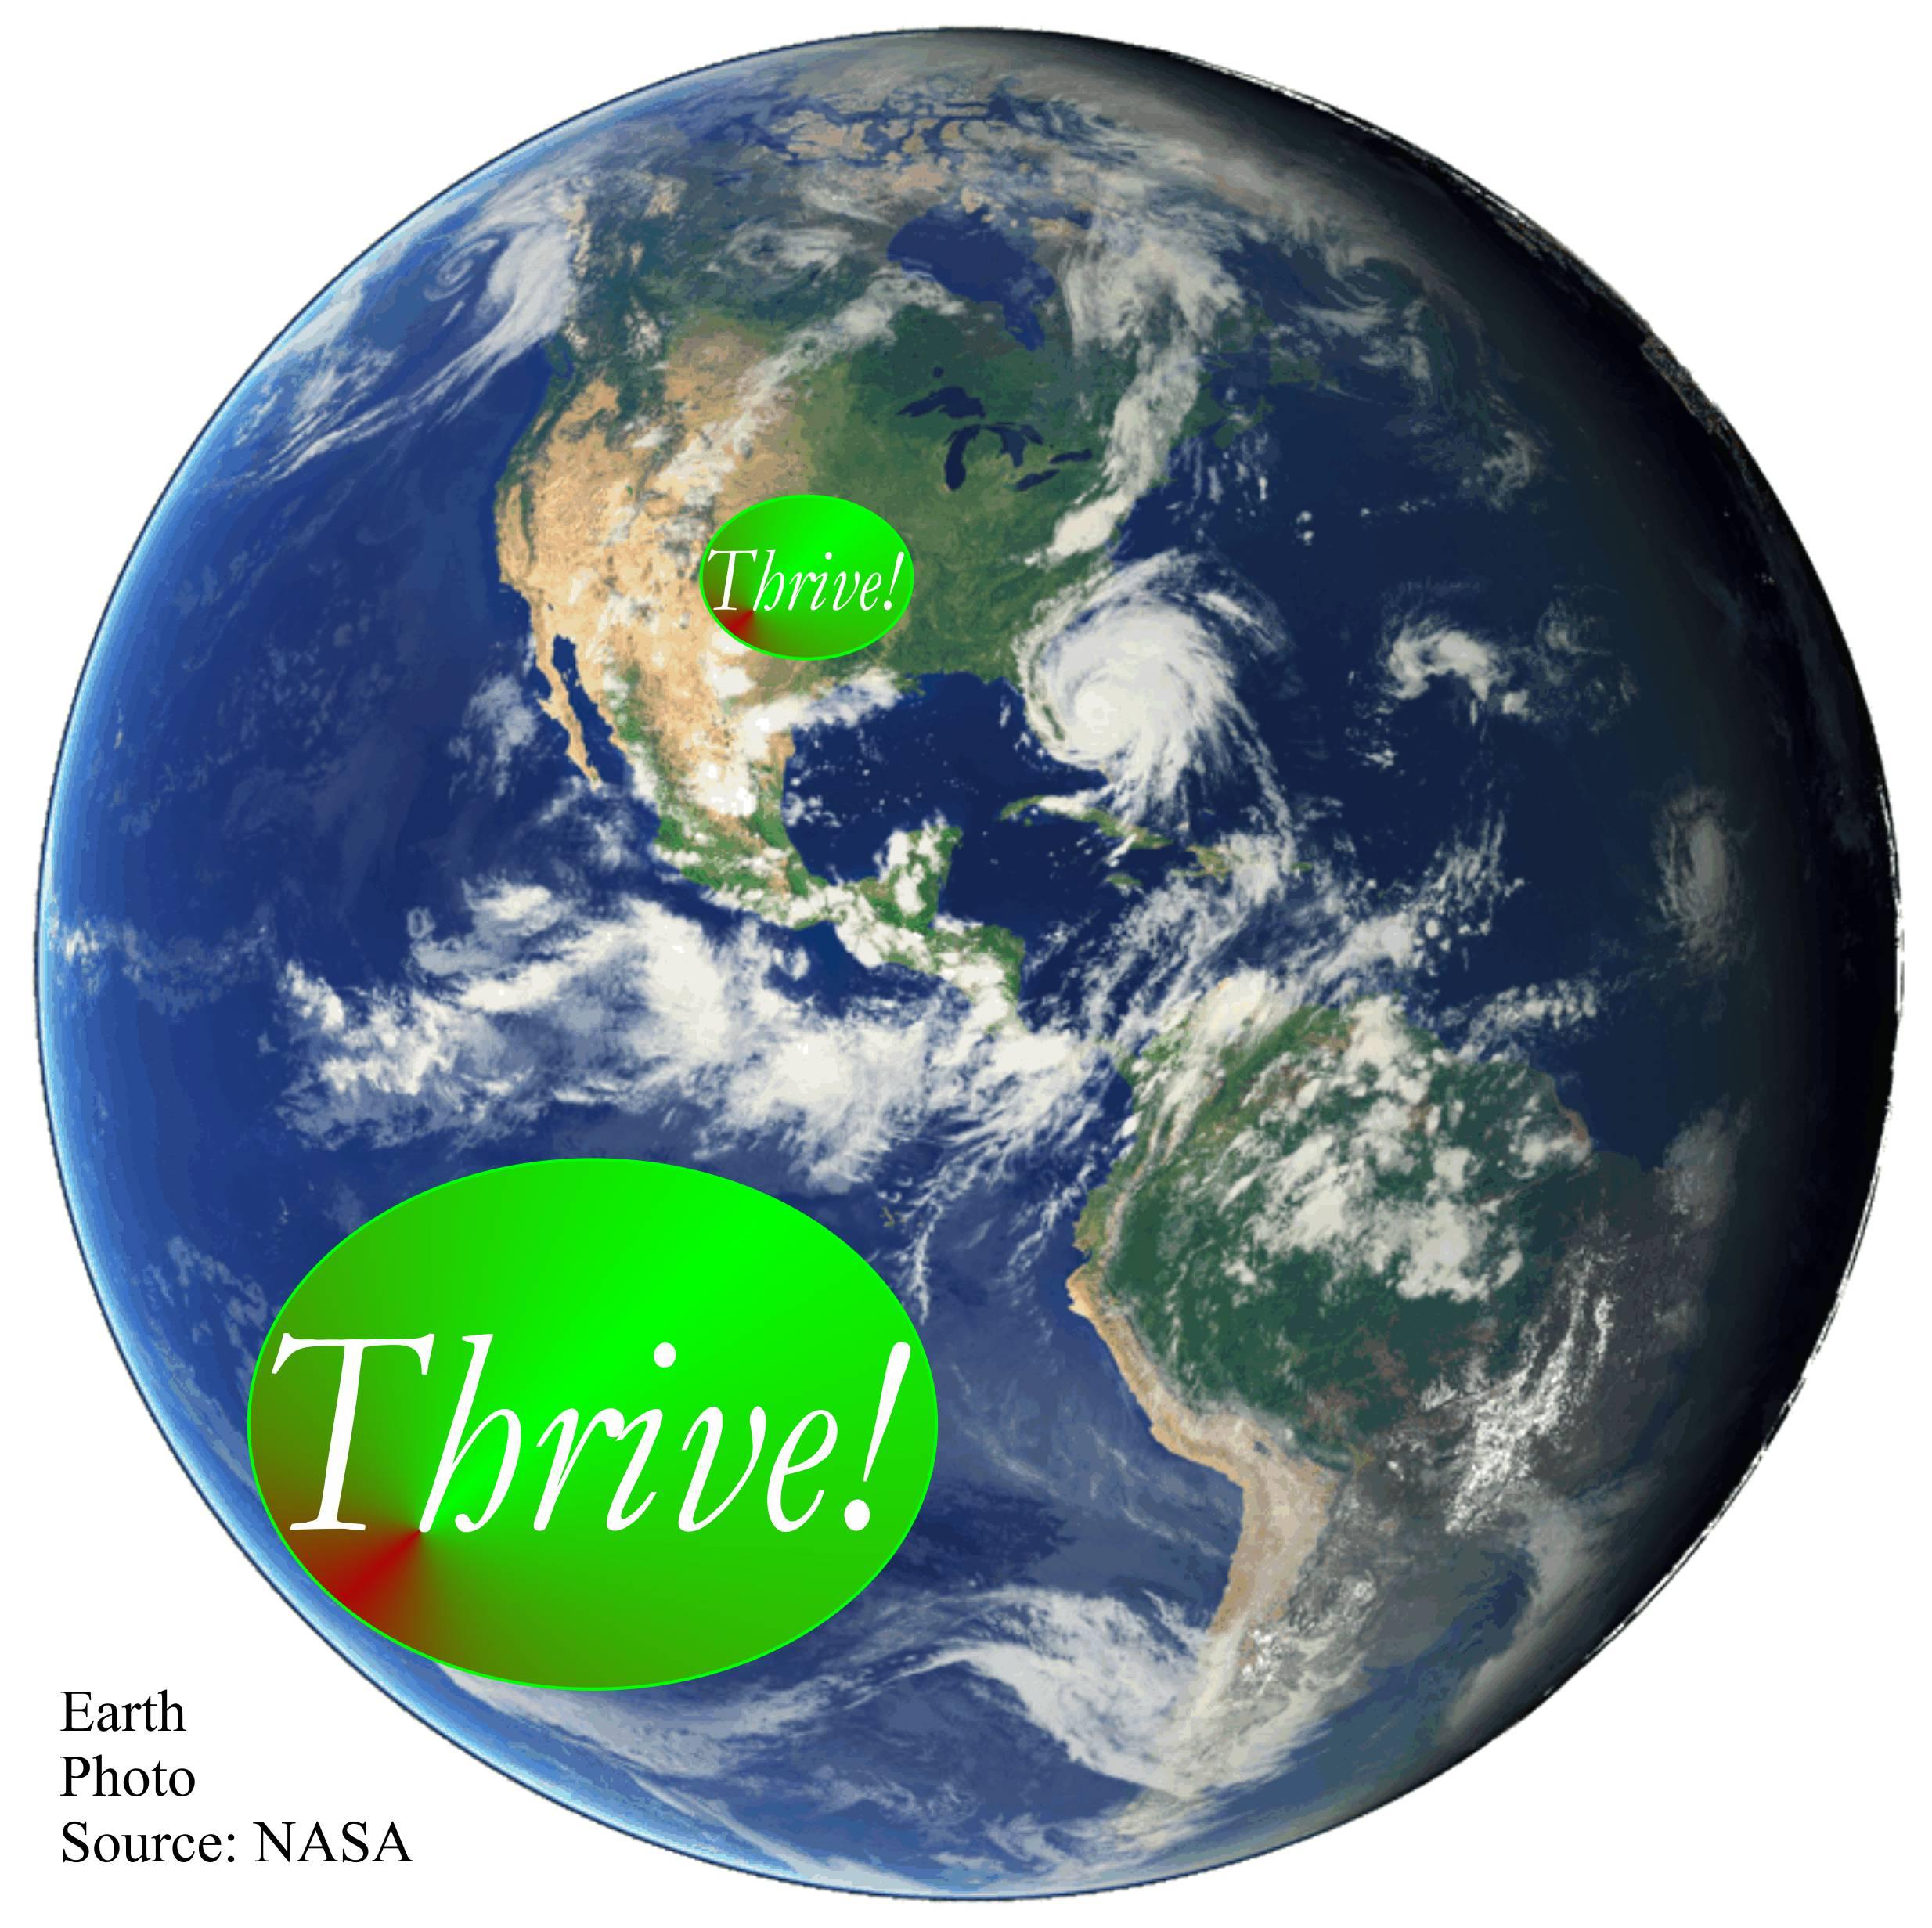 thrive-w-blue-oval-earth-america-122816